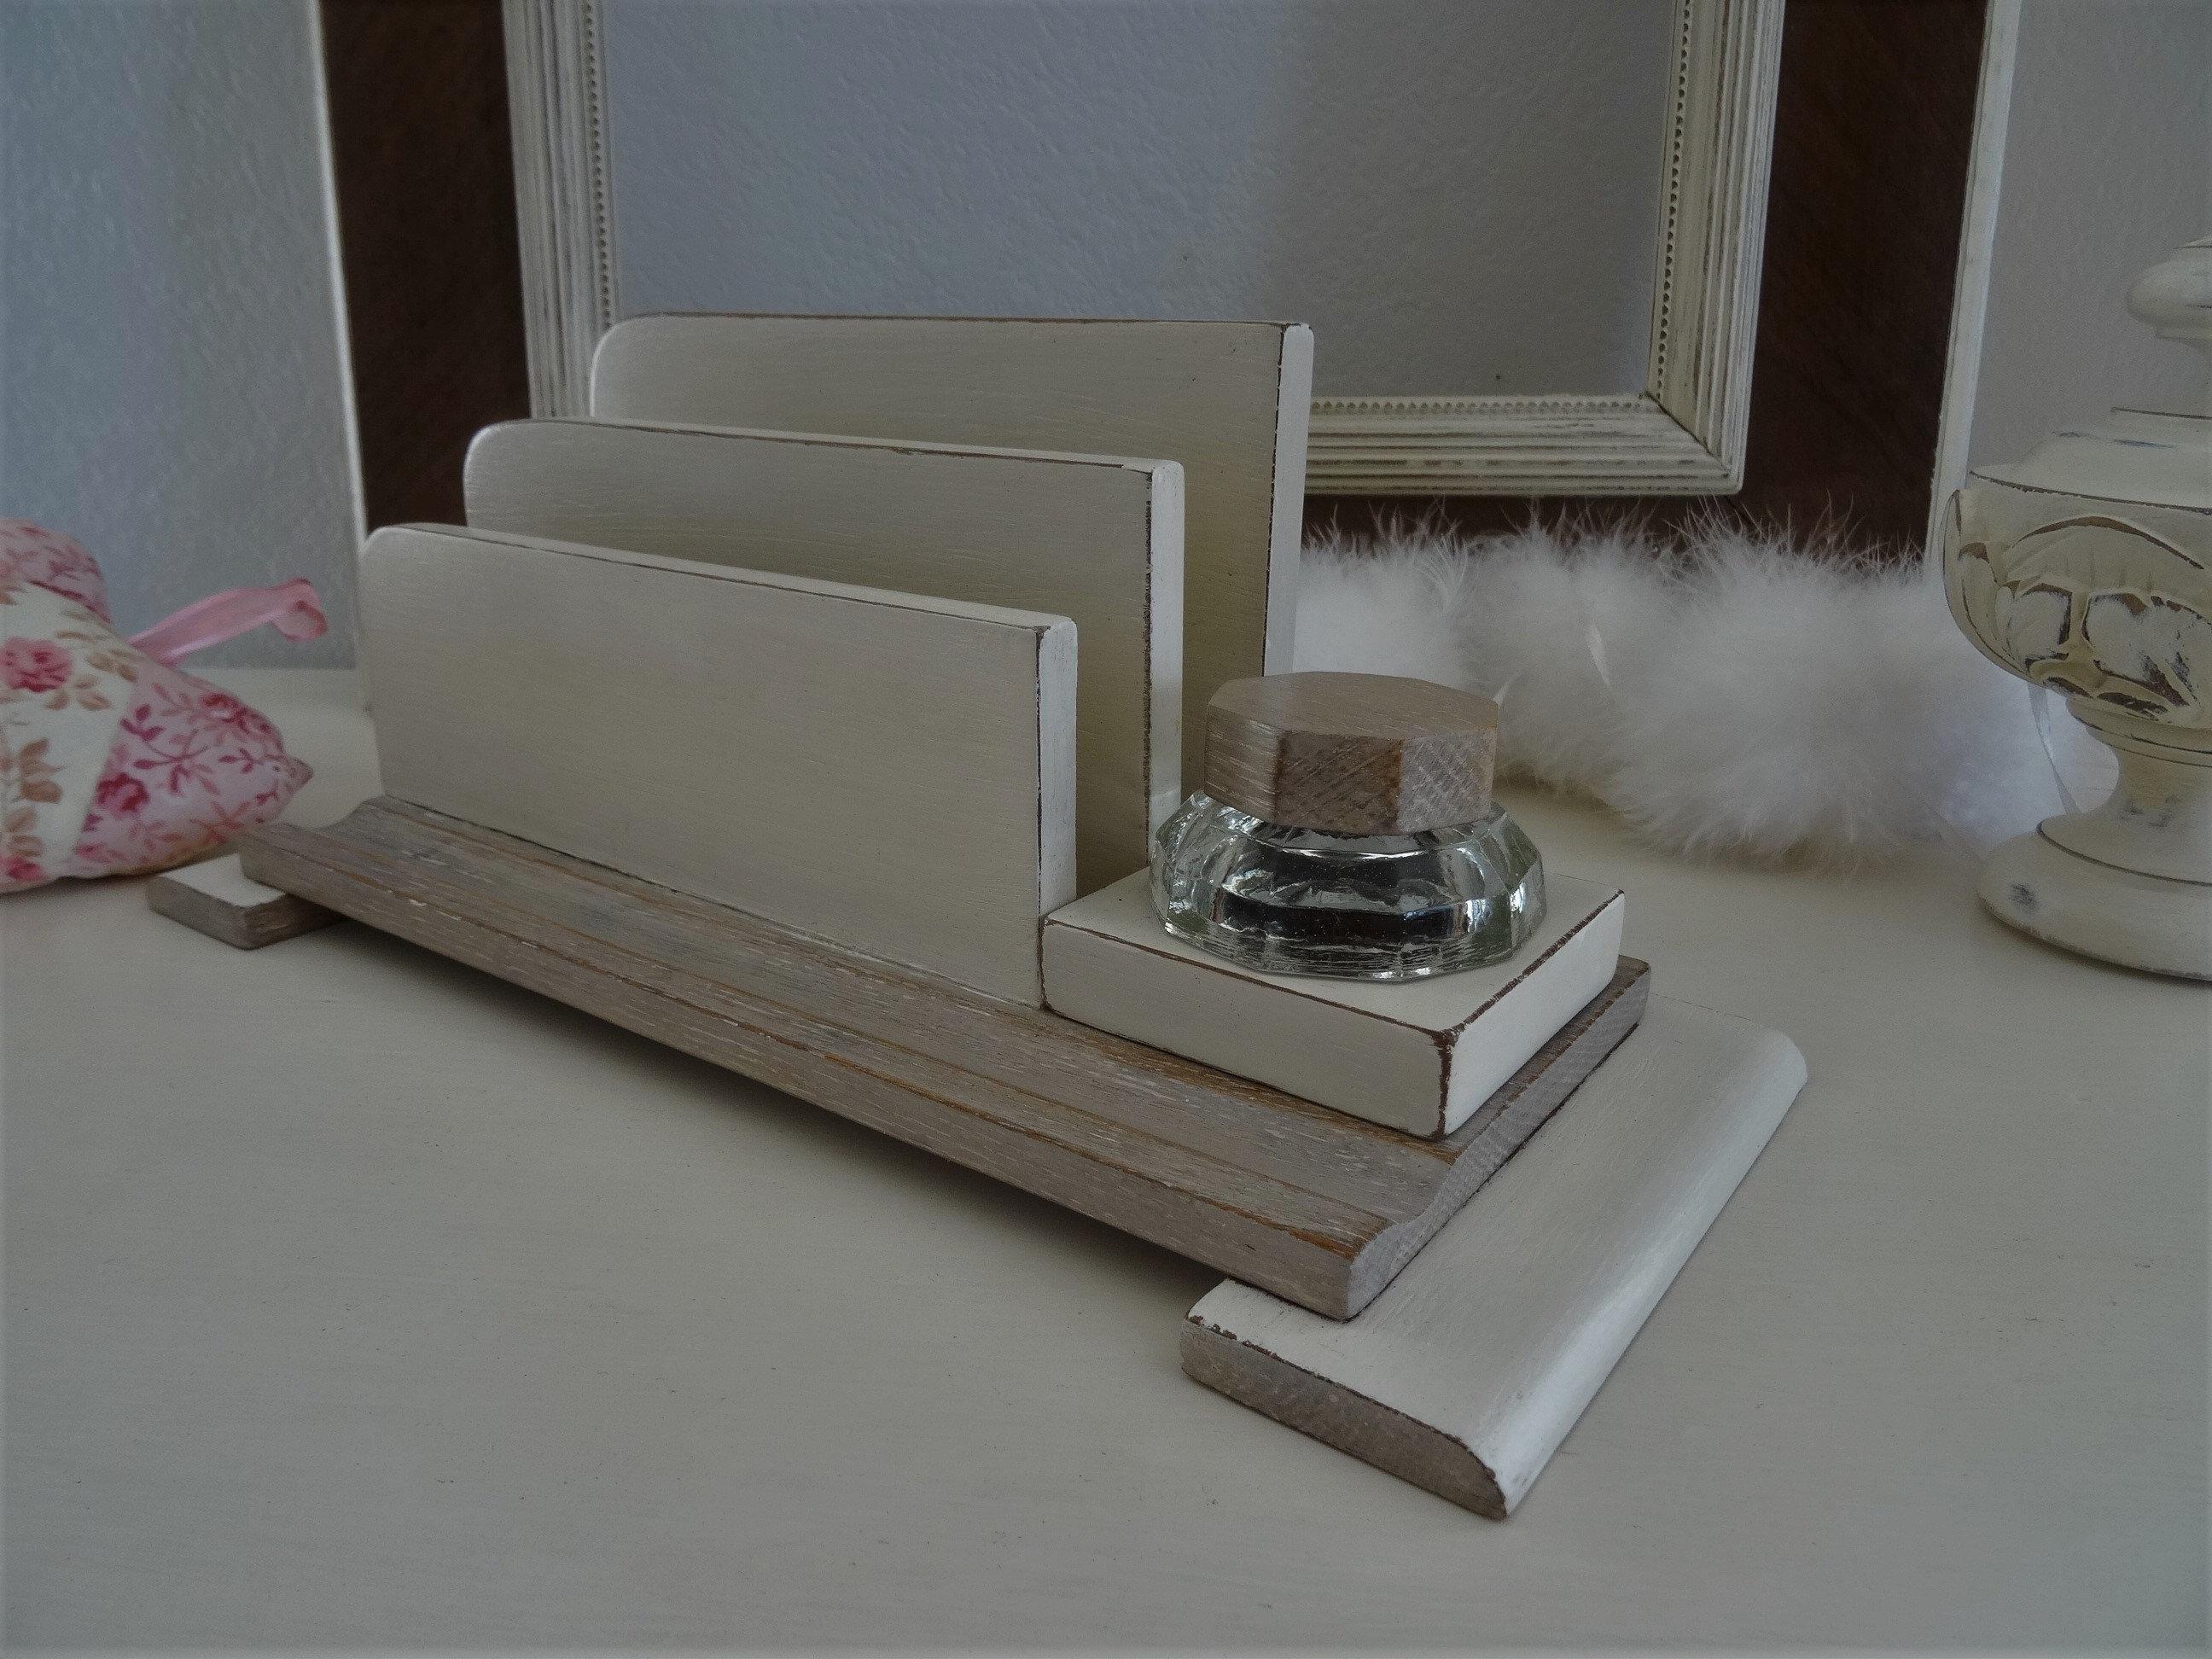 Décoratrice D Intérieur Rodez letter holder, mail range, office organizer, interior decoration, gift  idea, decorative object, glass inkwell, deco shabby, art deco design